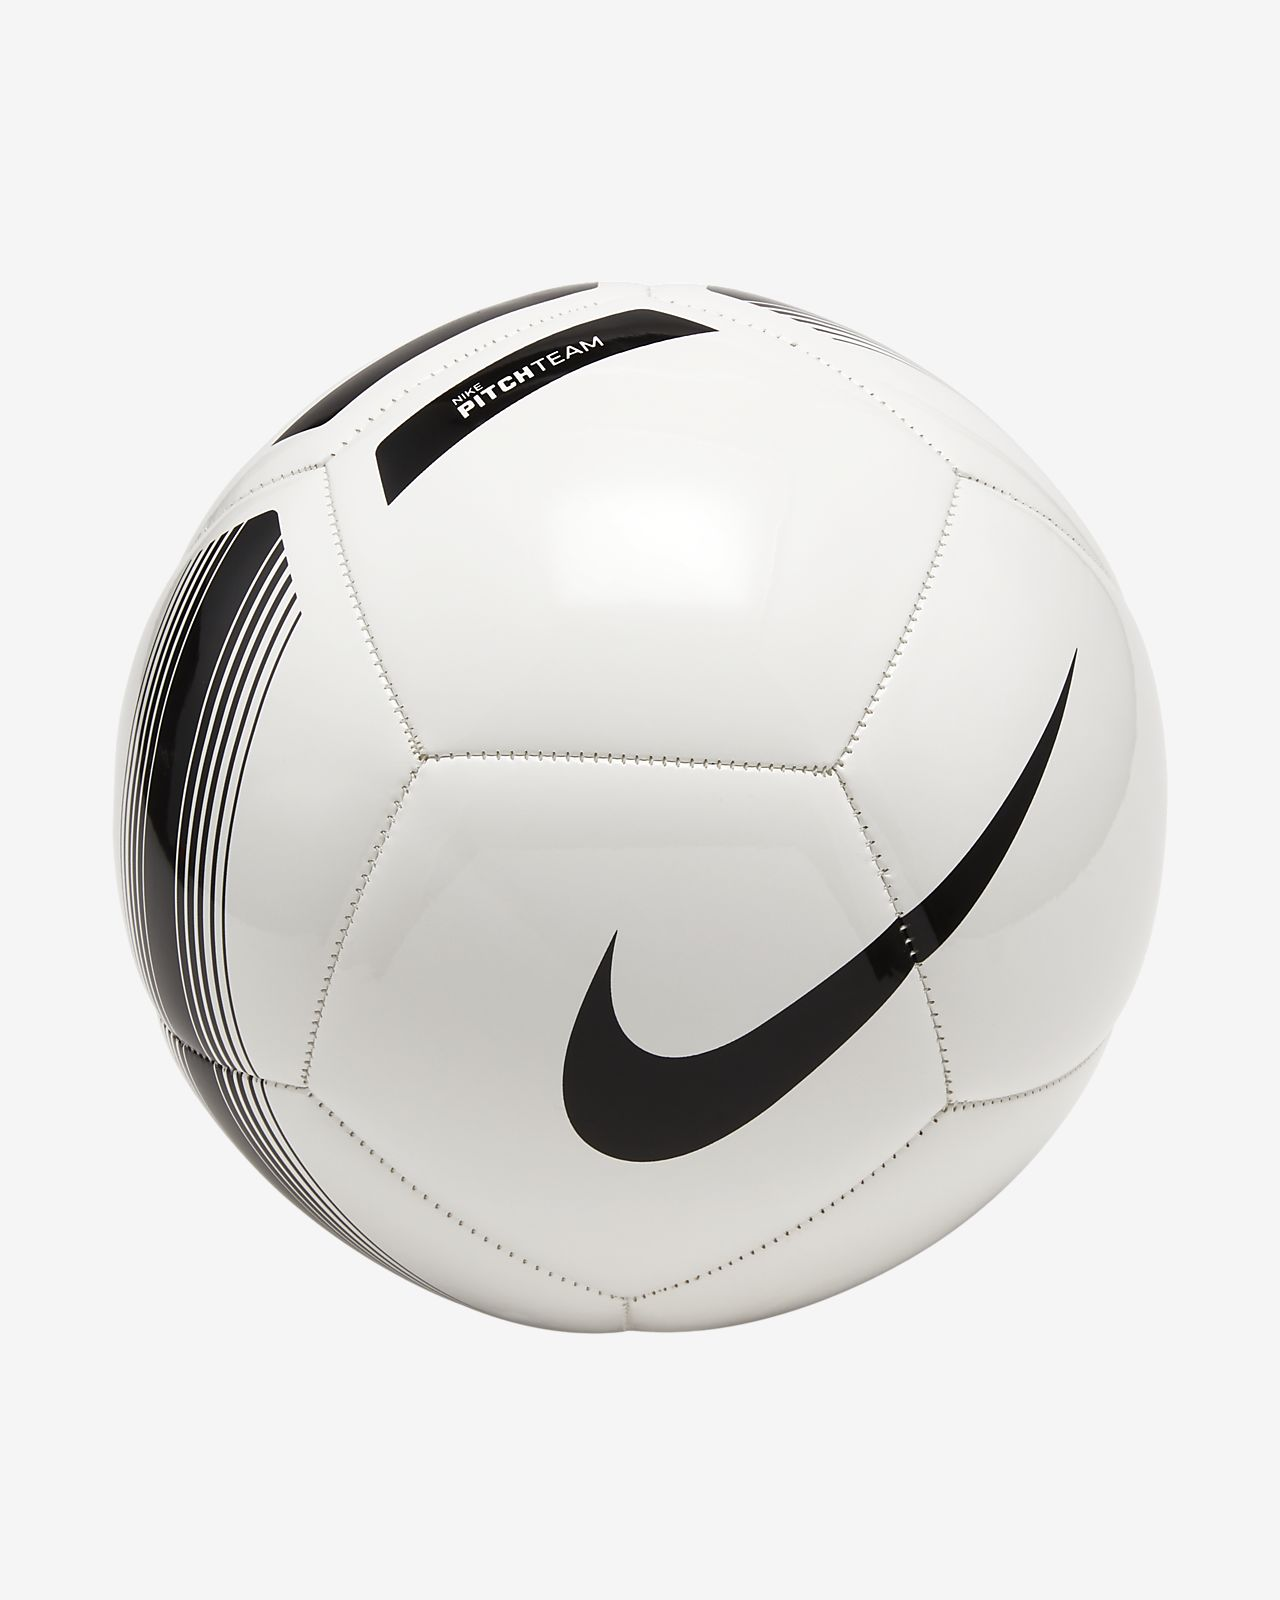 Bola de futebol Nike Pitch Team